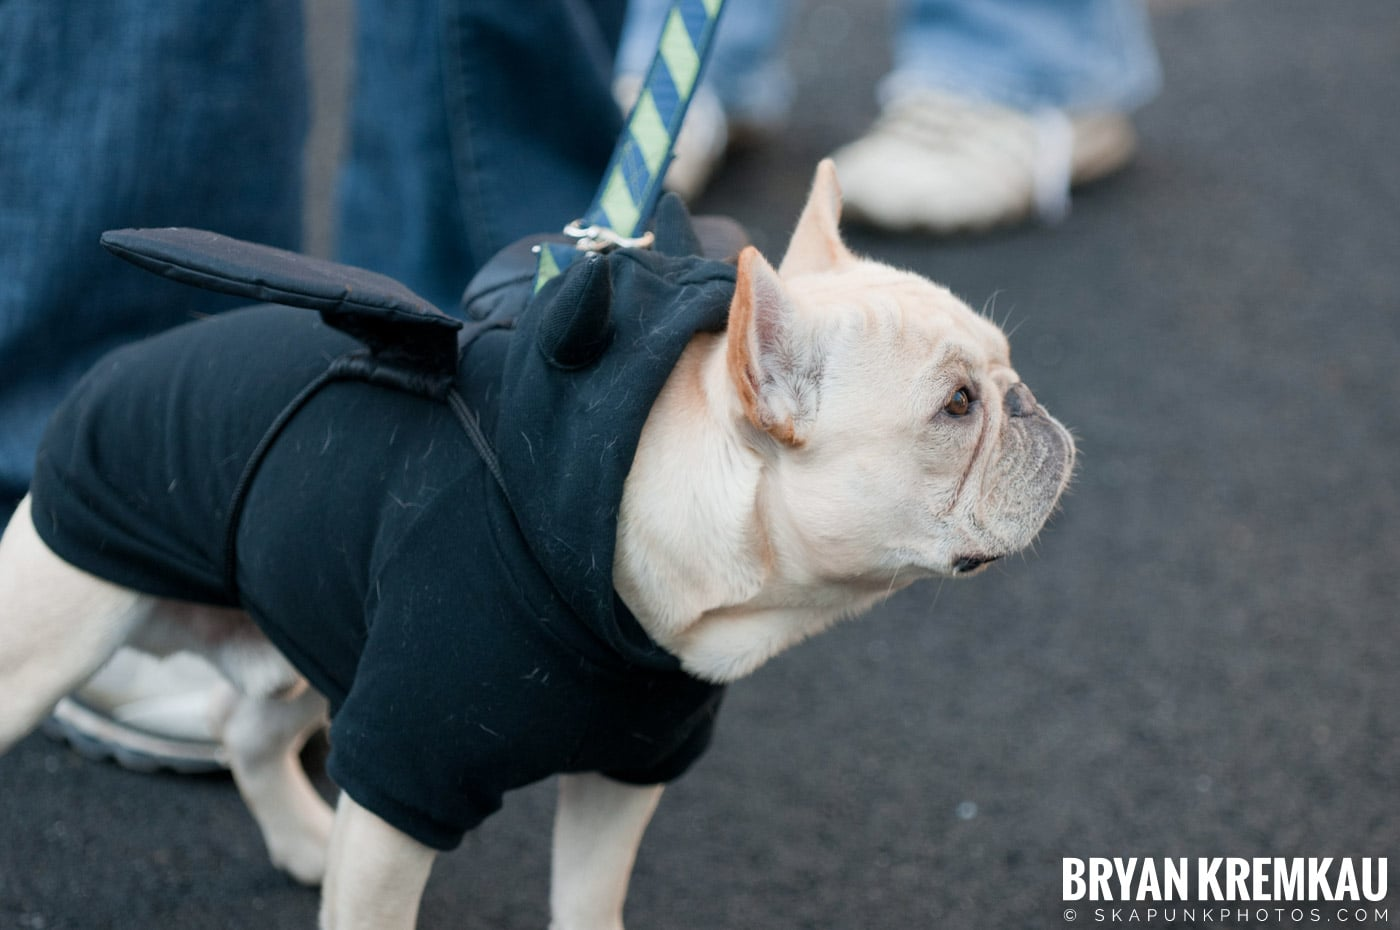 Paulus Hook Halloween Pet Parade 2011 @ Jersey City, NJ - 10.30.11 (68)